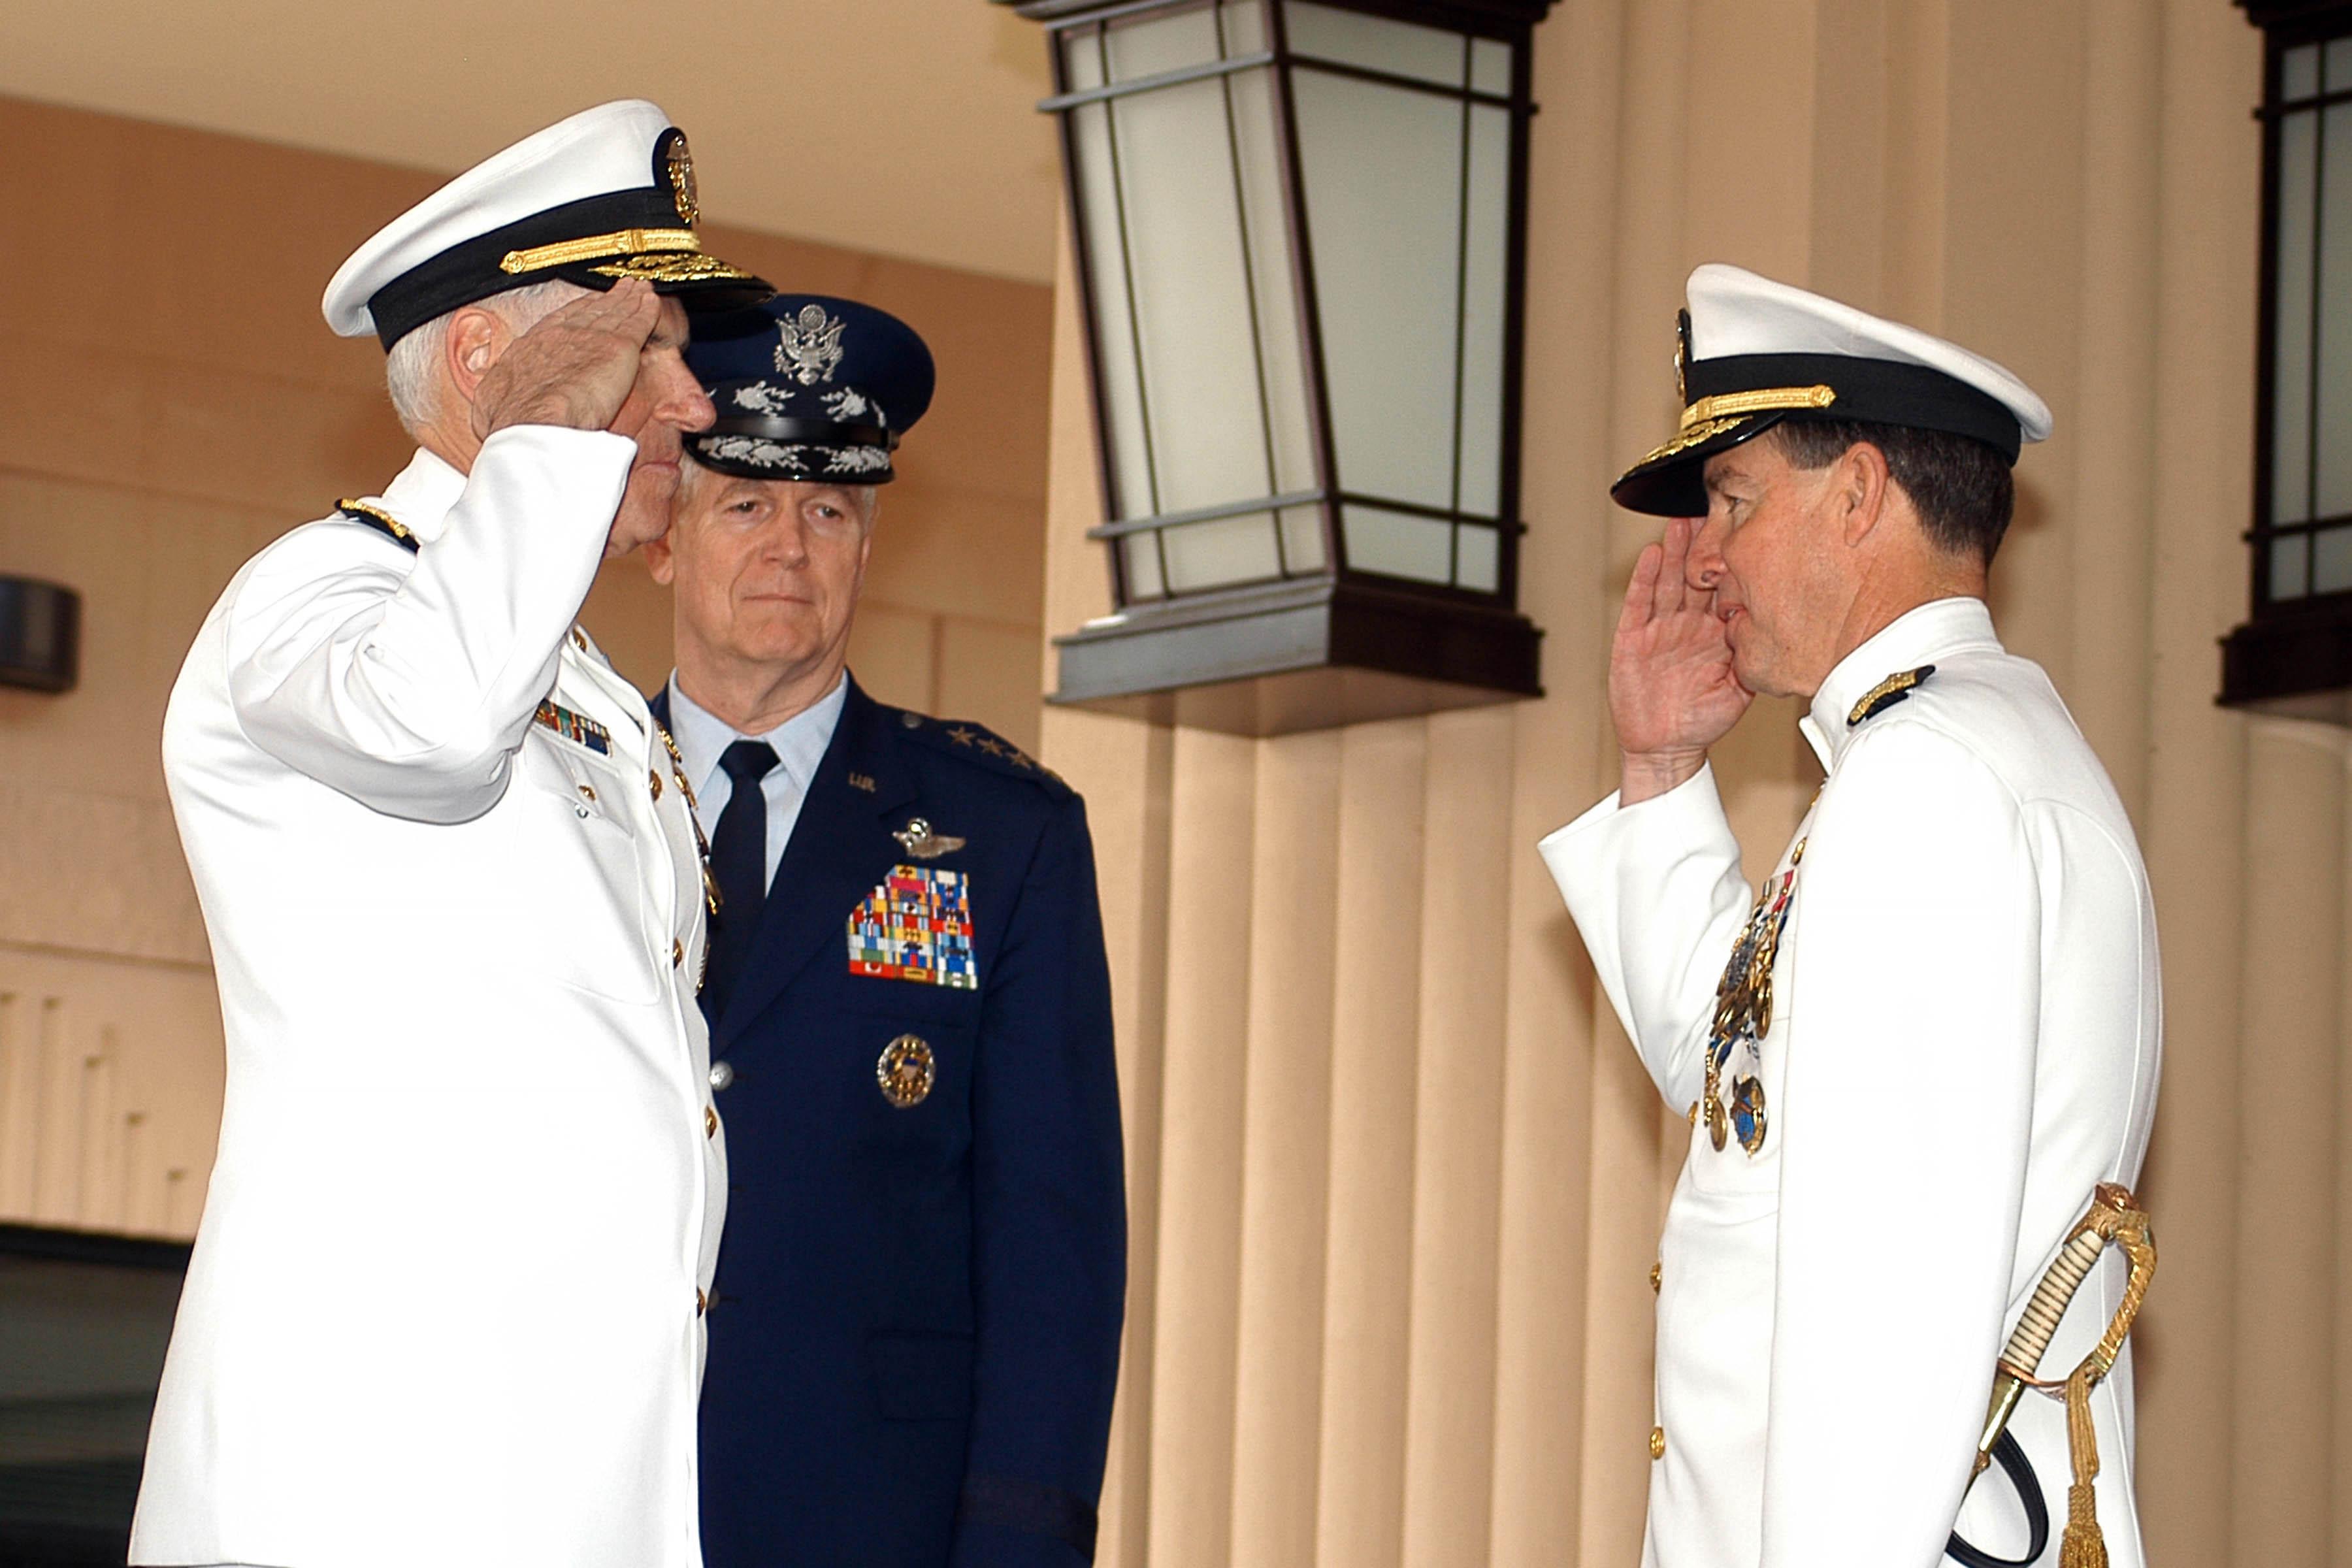 FileUS Navy 050226 N 5640H 076 Adm Thomas B Fargo Right Salutes Adm William J Fallon